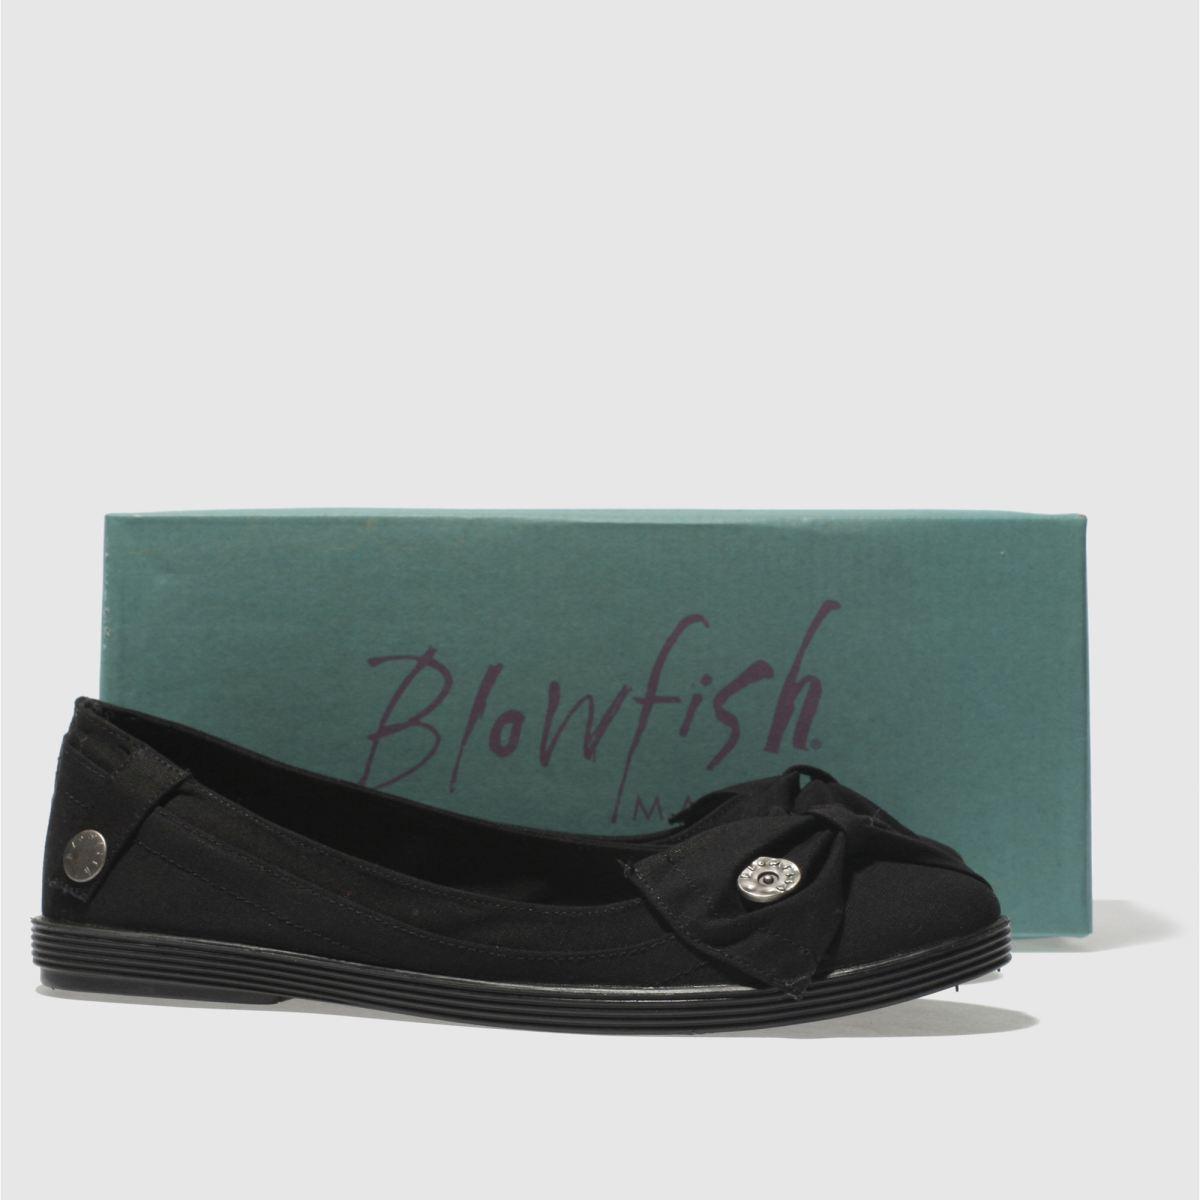 Damen Schwarz schuh blowfish Gimlet Flats | schuh Schwarz Gute Qualität beliebte Schuhe eb79db